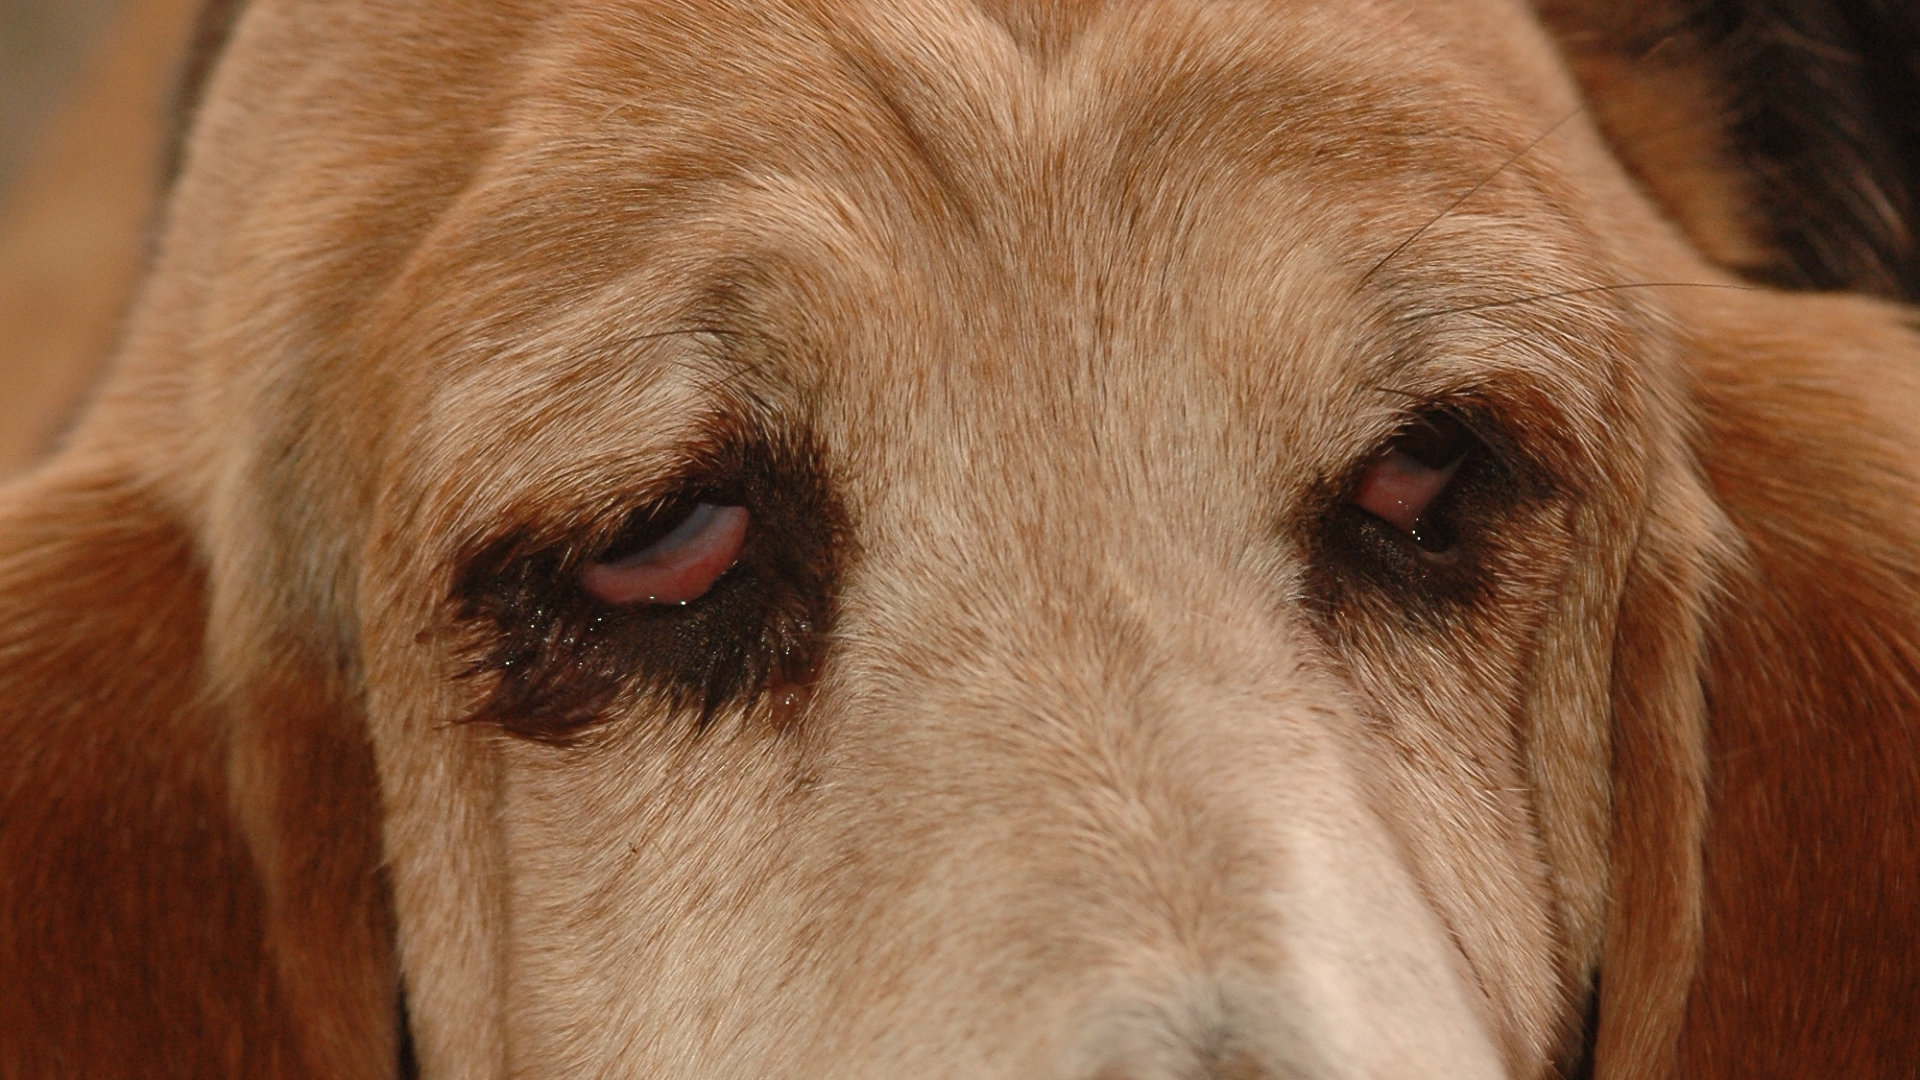 paraziti u psa priznaky)